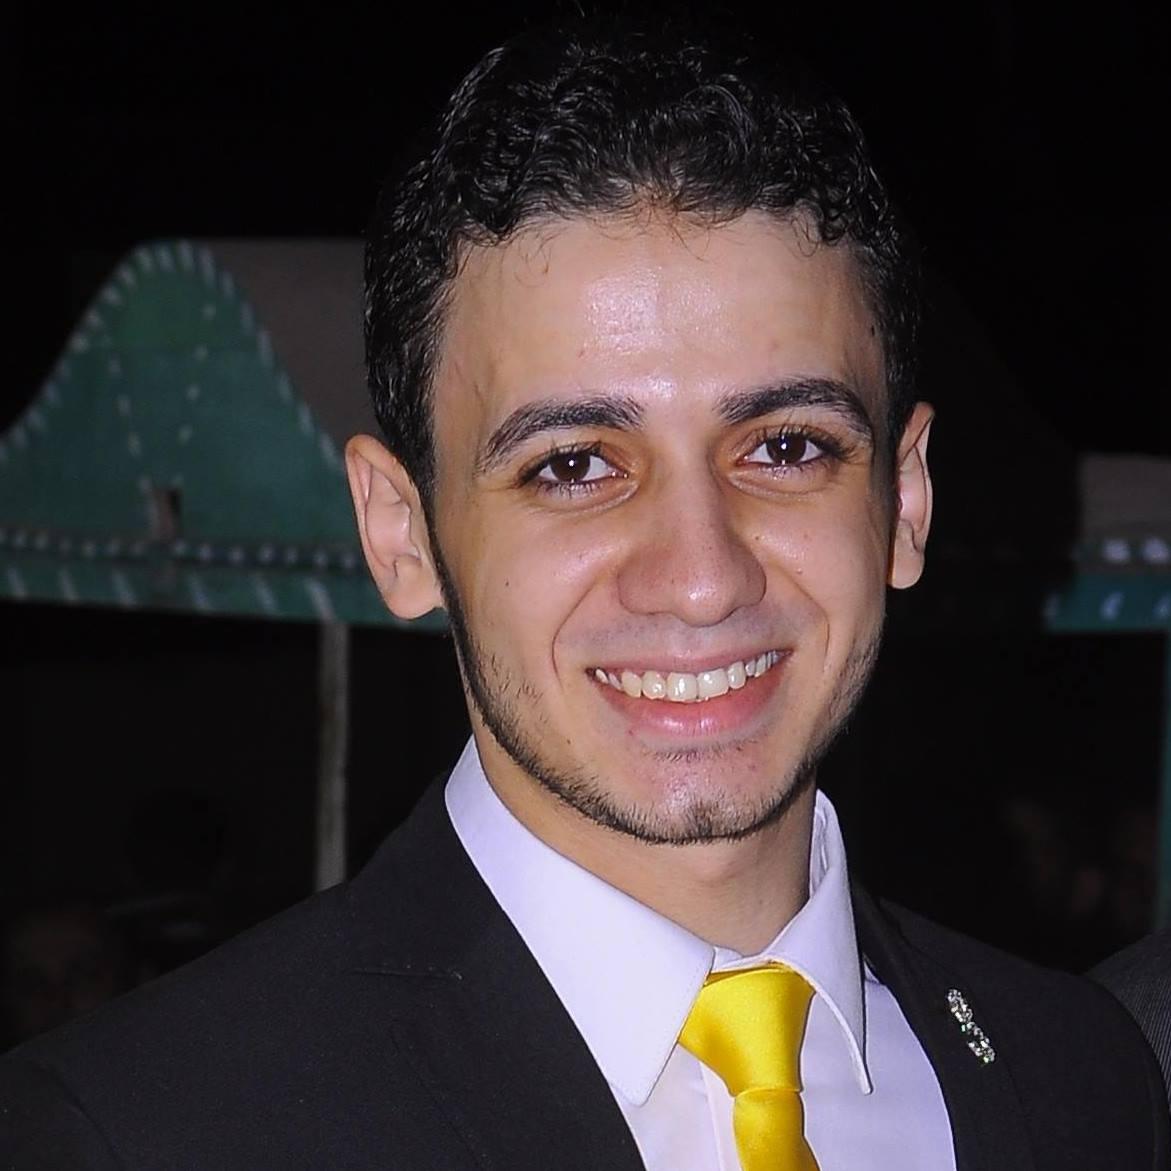 AutoCAD Course - دورة الاوتوكاد الاحترافيه للباشمهندس - عمرو ربيع - من البدايه حتي الاحتراف .